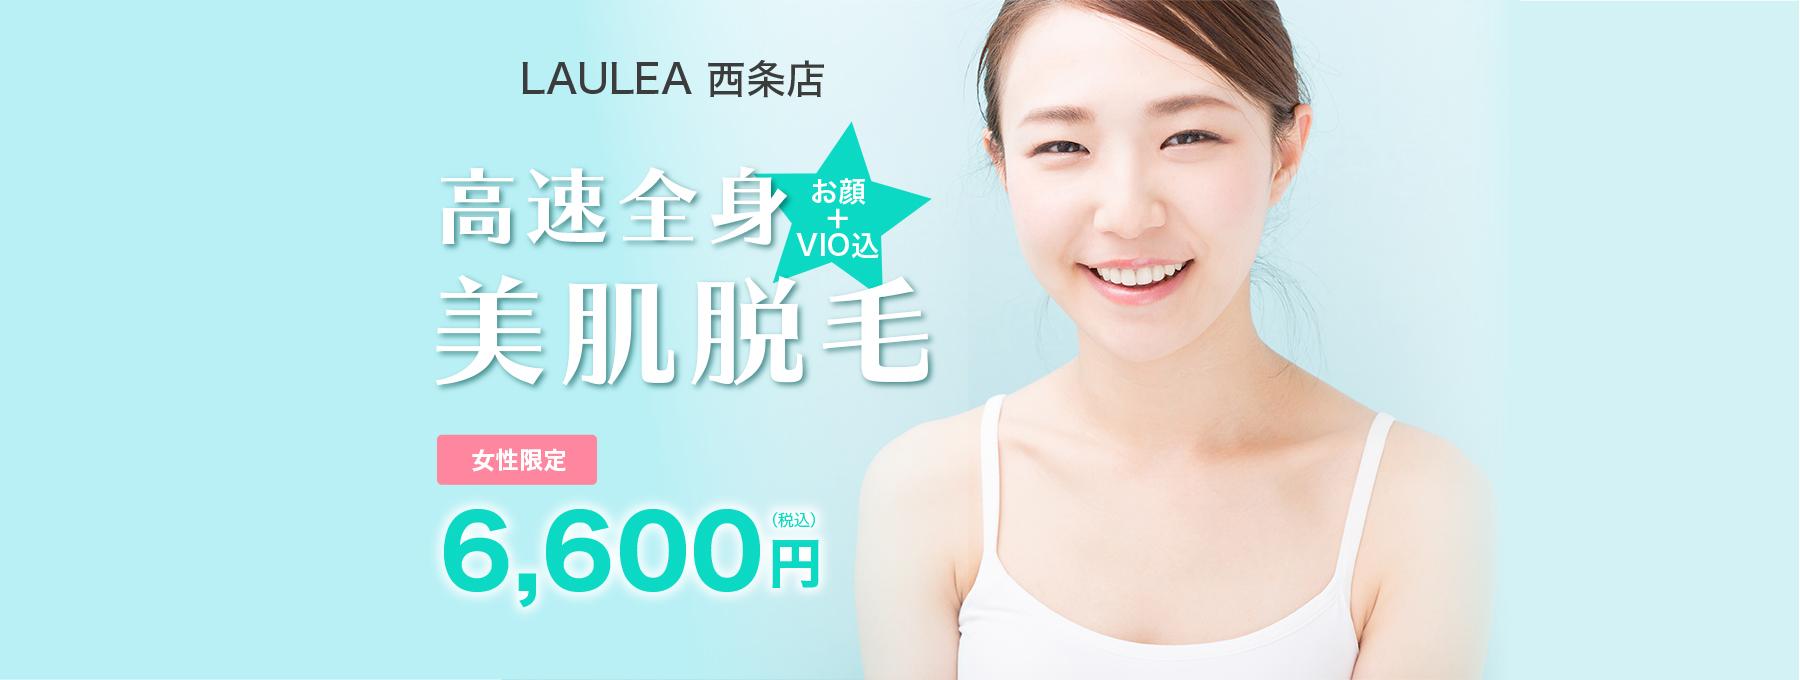 LAULEA西条店 高速前進美肌脱毛 お顔+vio込 女性限定8000円